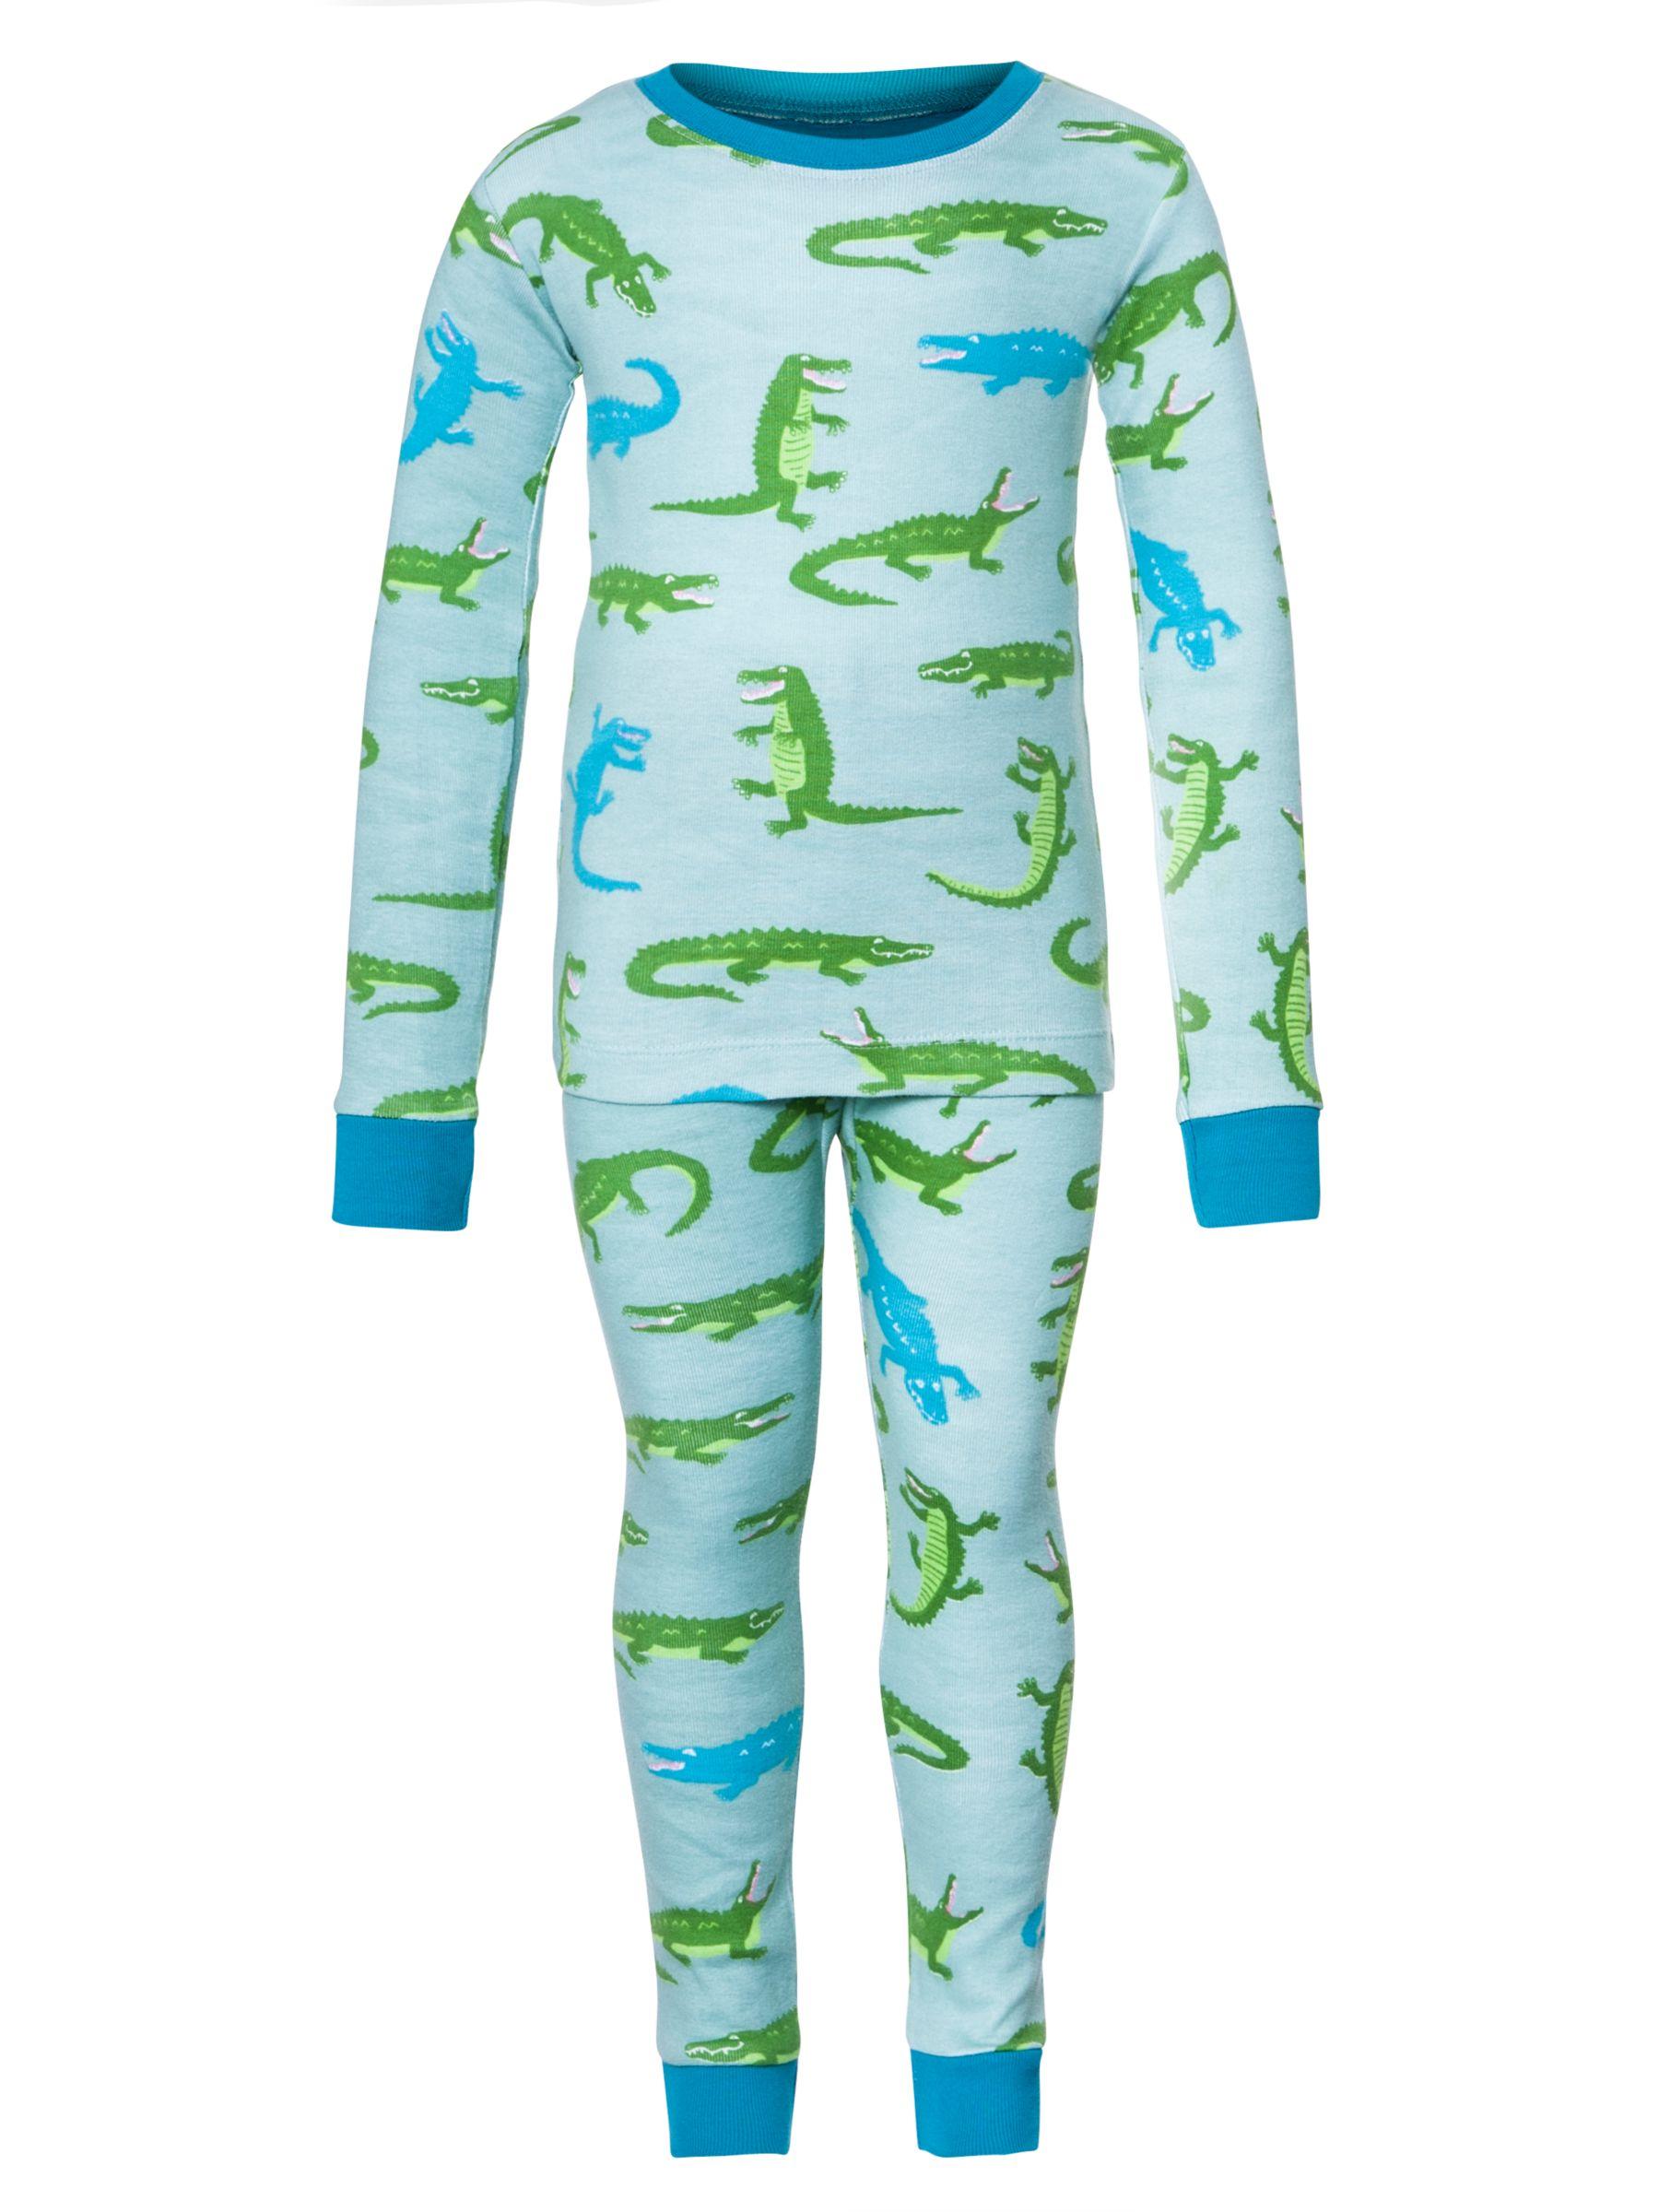 Hatley Boys' Crocodile Pyjamas, Green